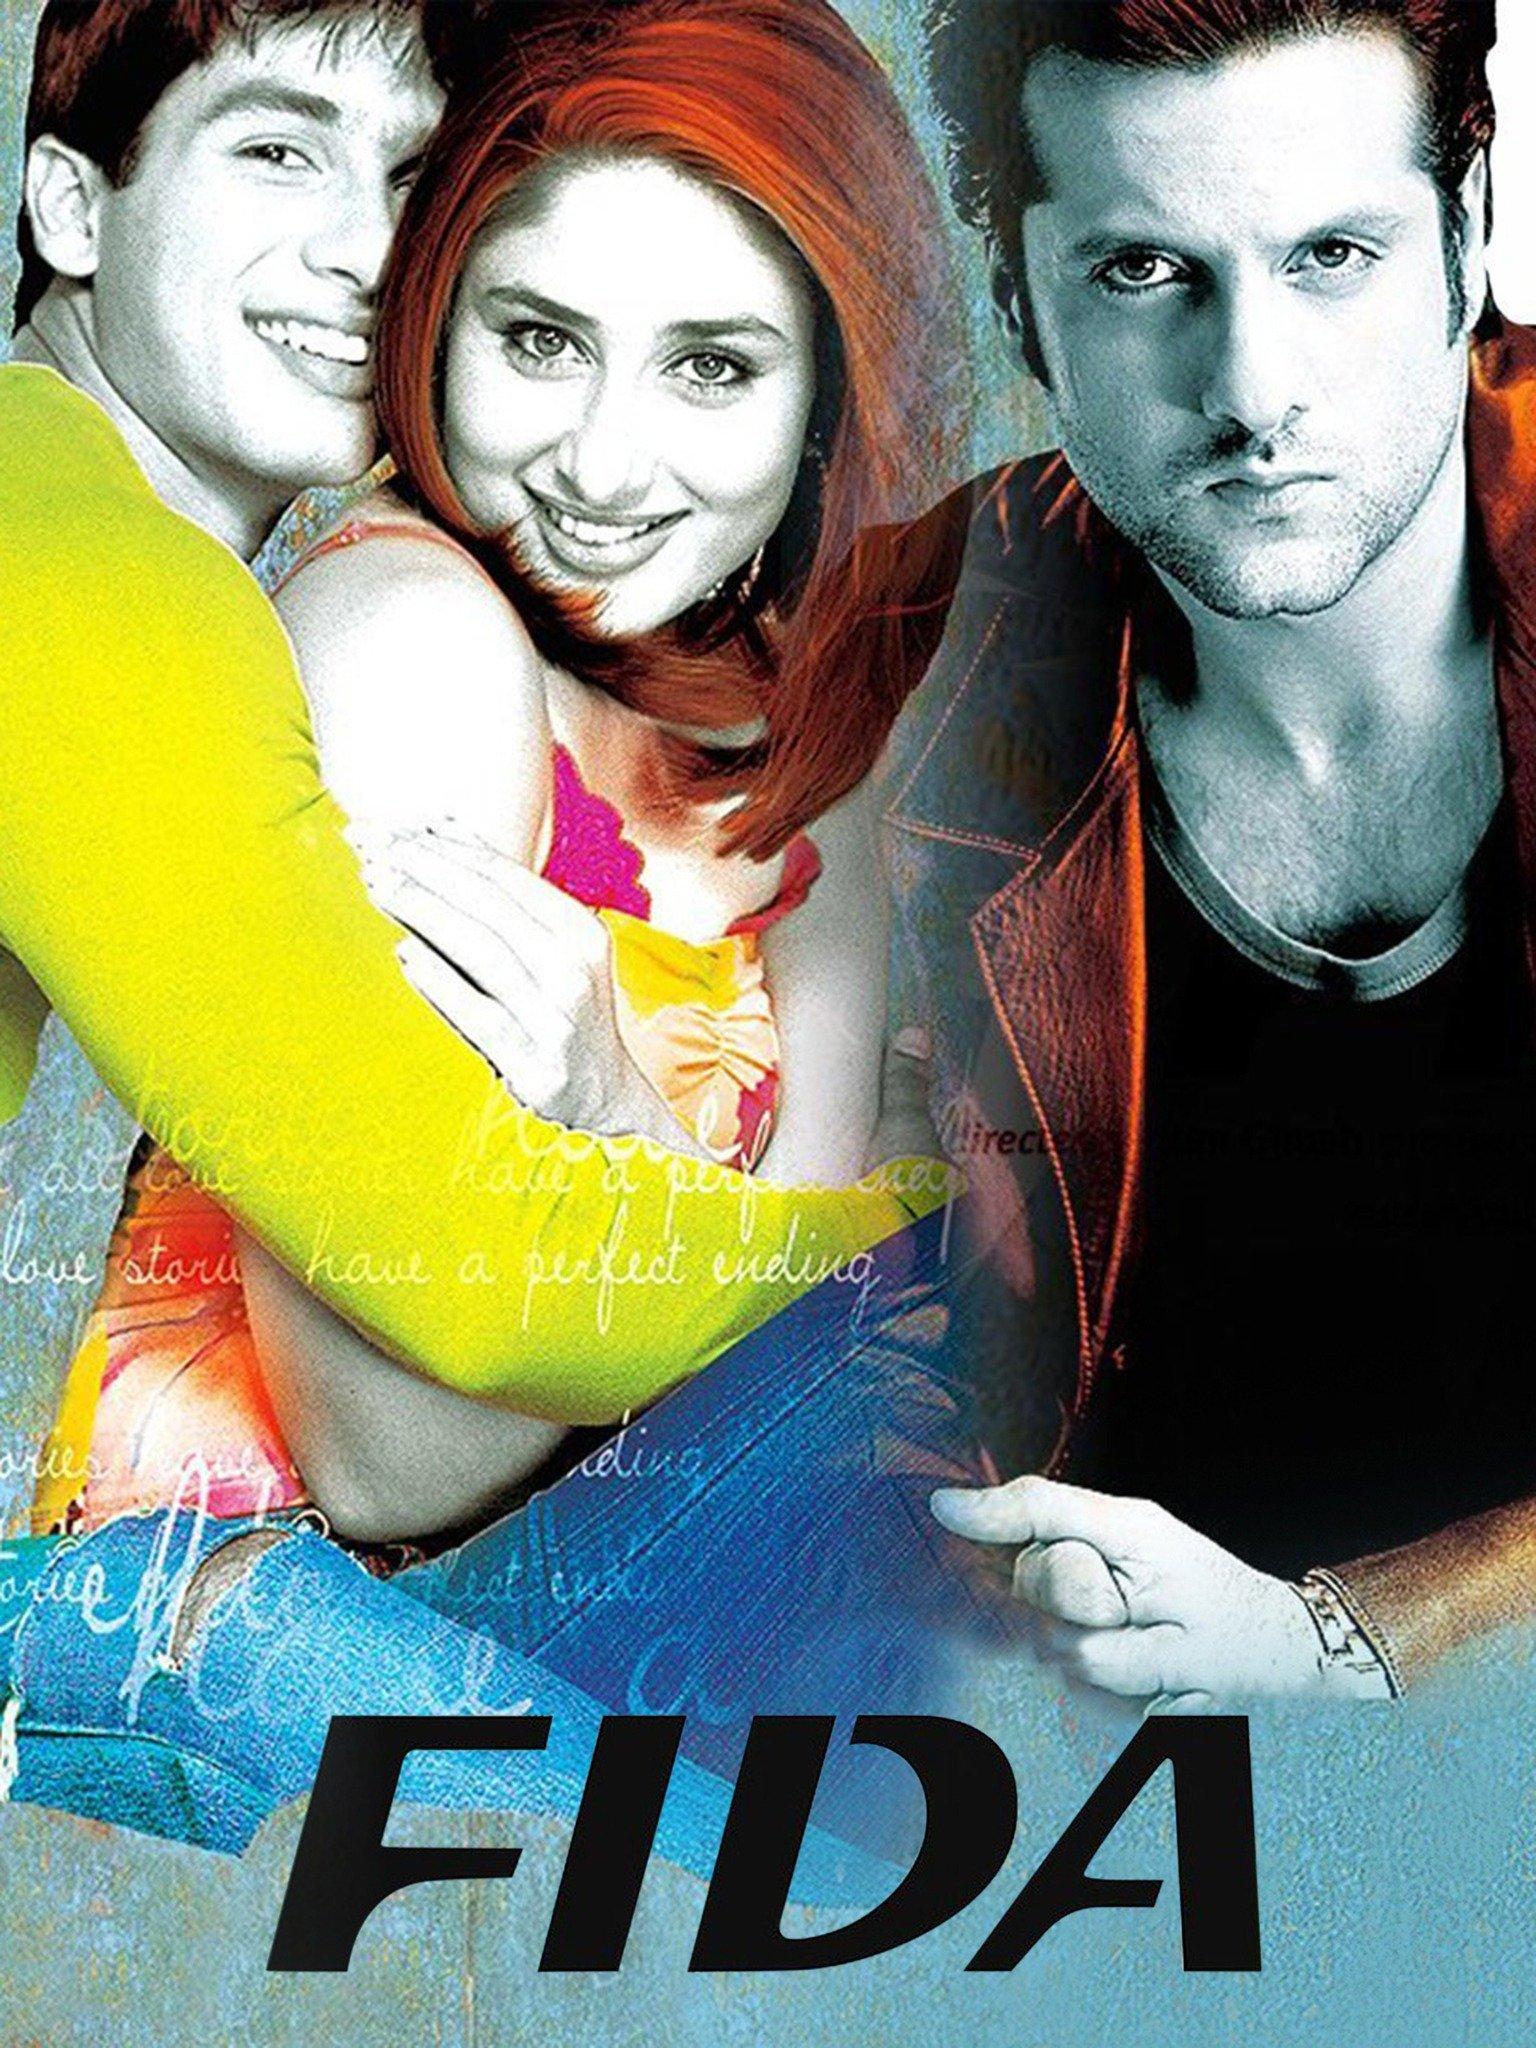 Fitta Film